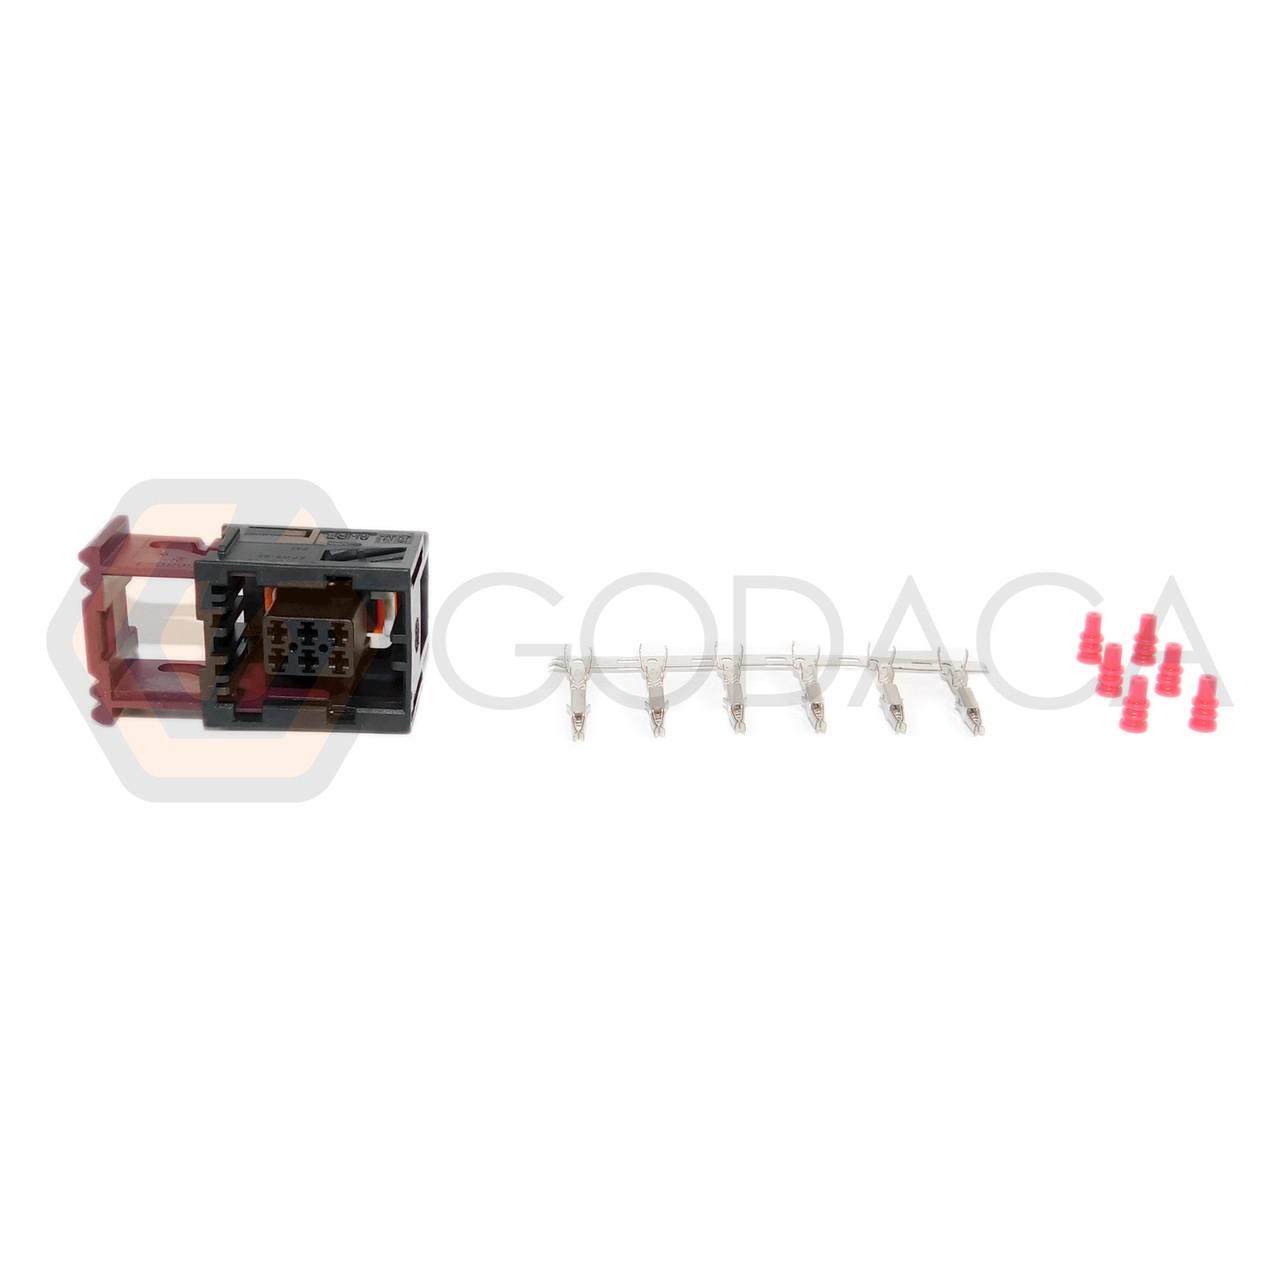 medium resolution of 1x connector 6 way 6 pin for gm door lock actuator 88986251 w out wire godaca llc